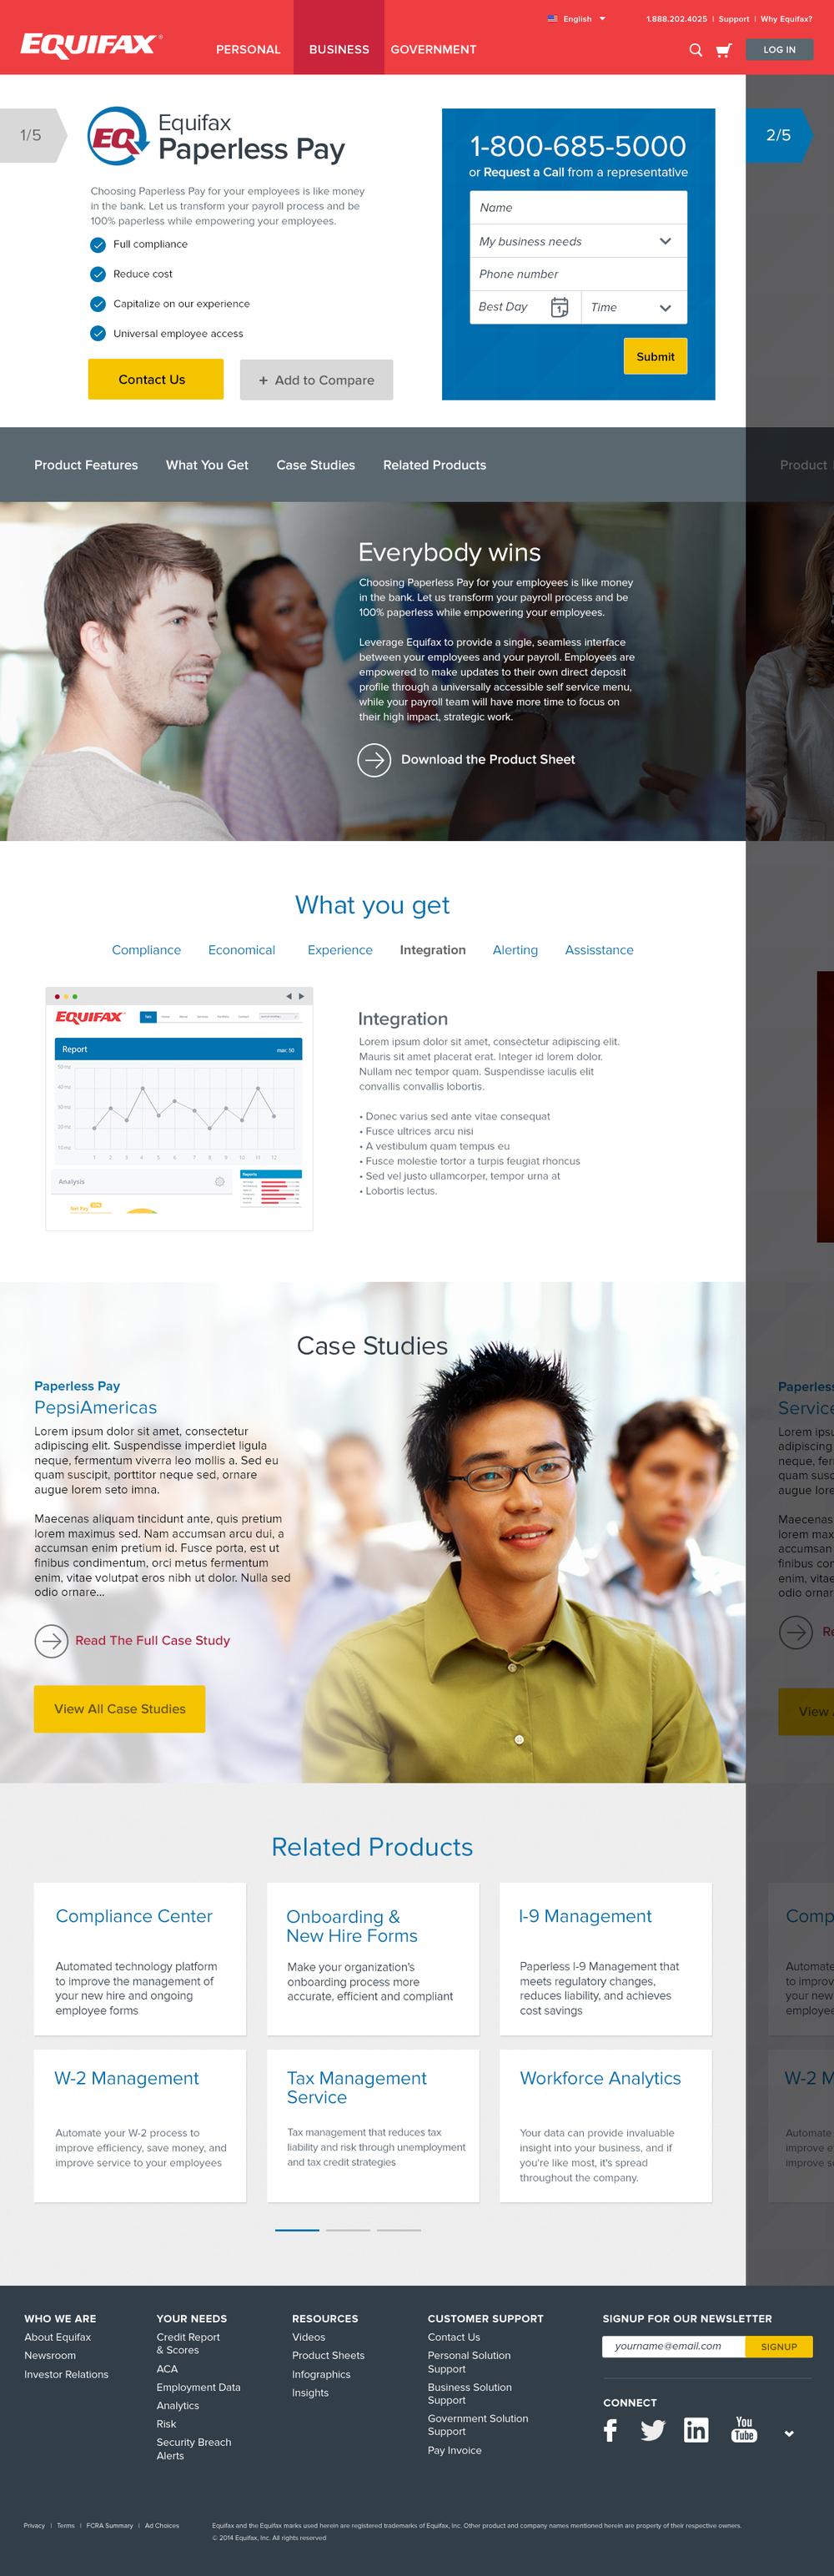 Equifax-B2B-Product_Page-092314.jpg